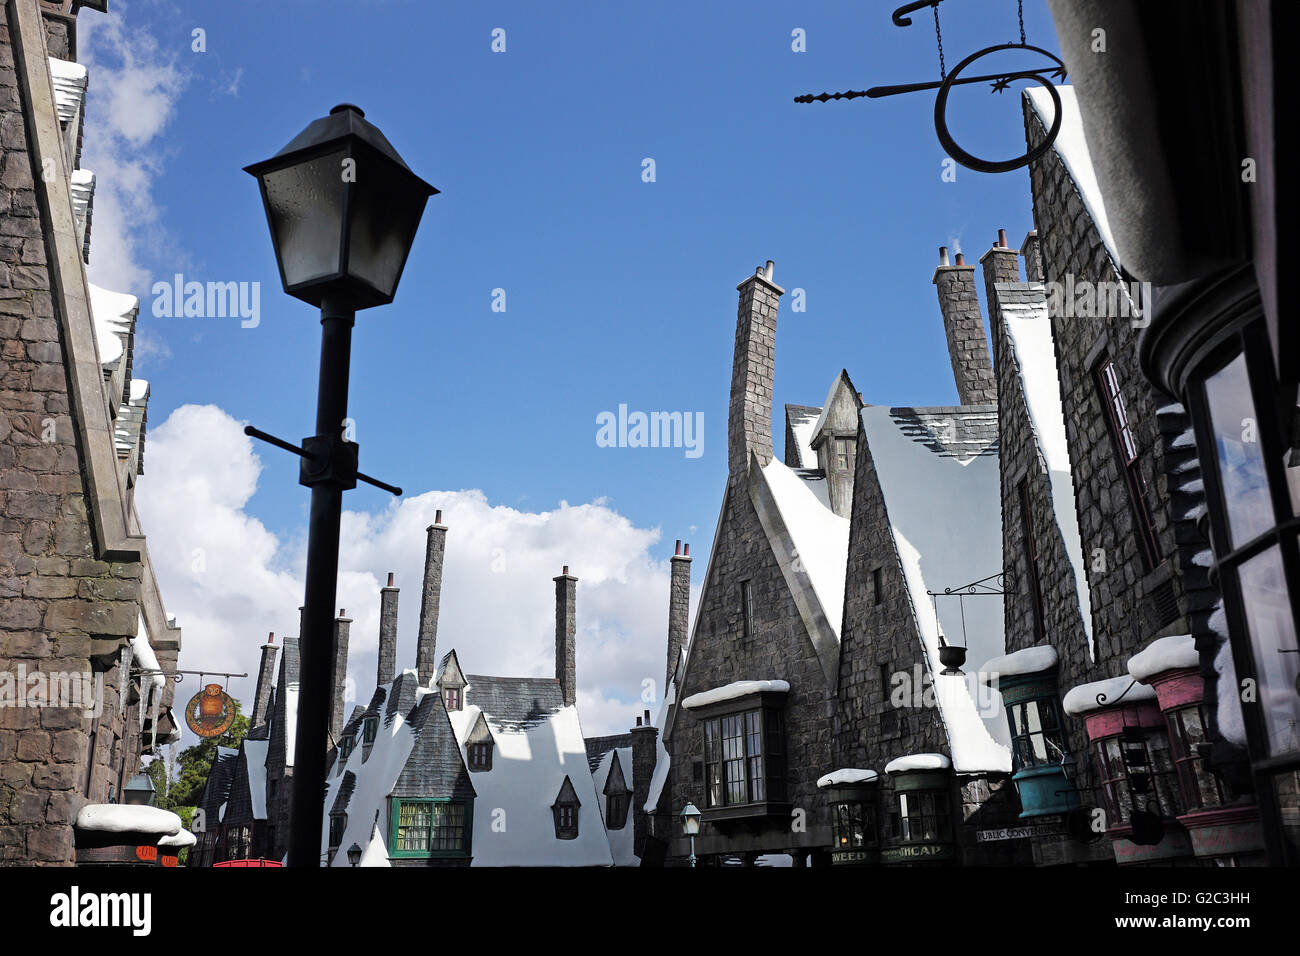 Harry Potter World at Universal Studios California - Stock Image